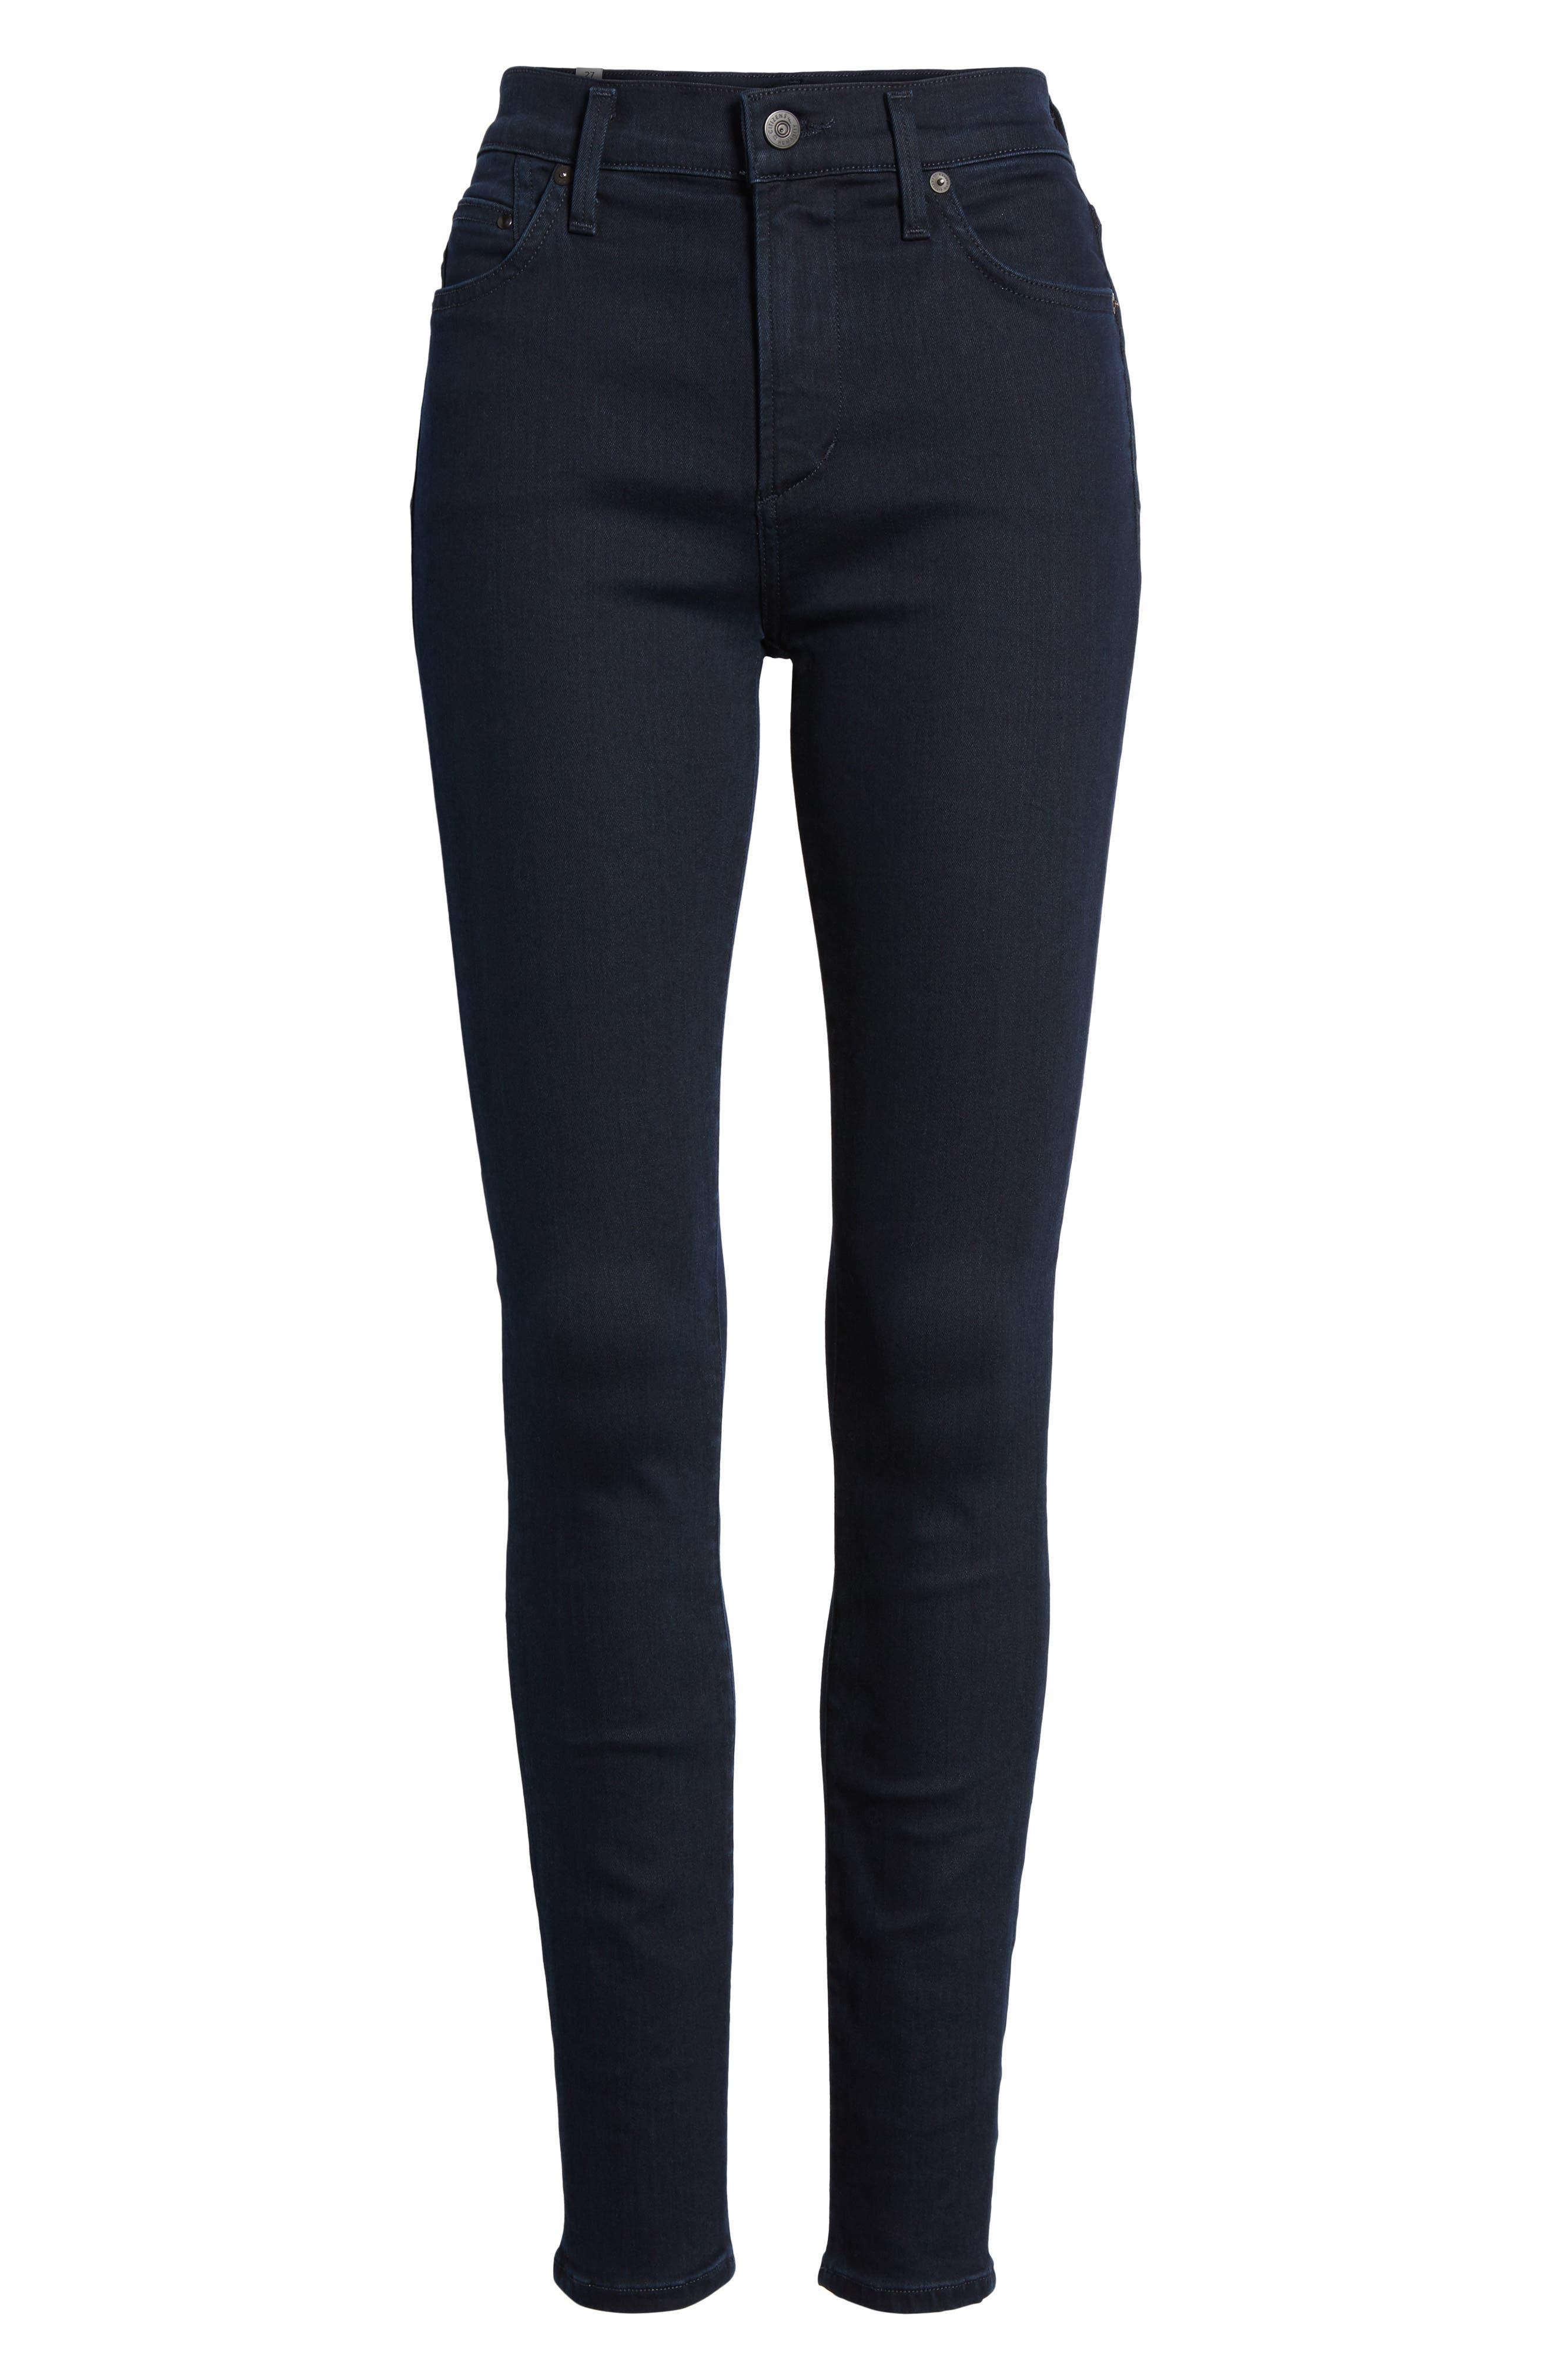 Rocket High Waist Skinny Jeans,                             Alternate thumbnail 7, color,                             409